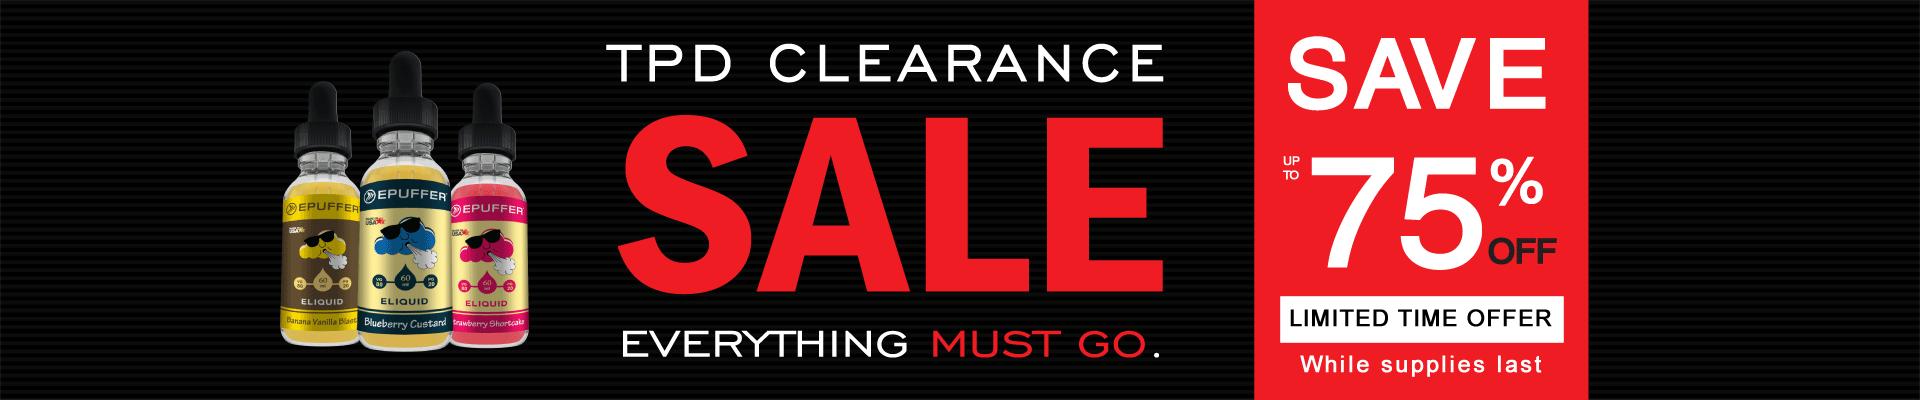 TPD Clearance Vape Sale